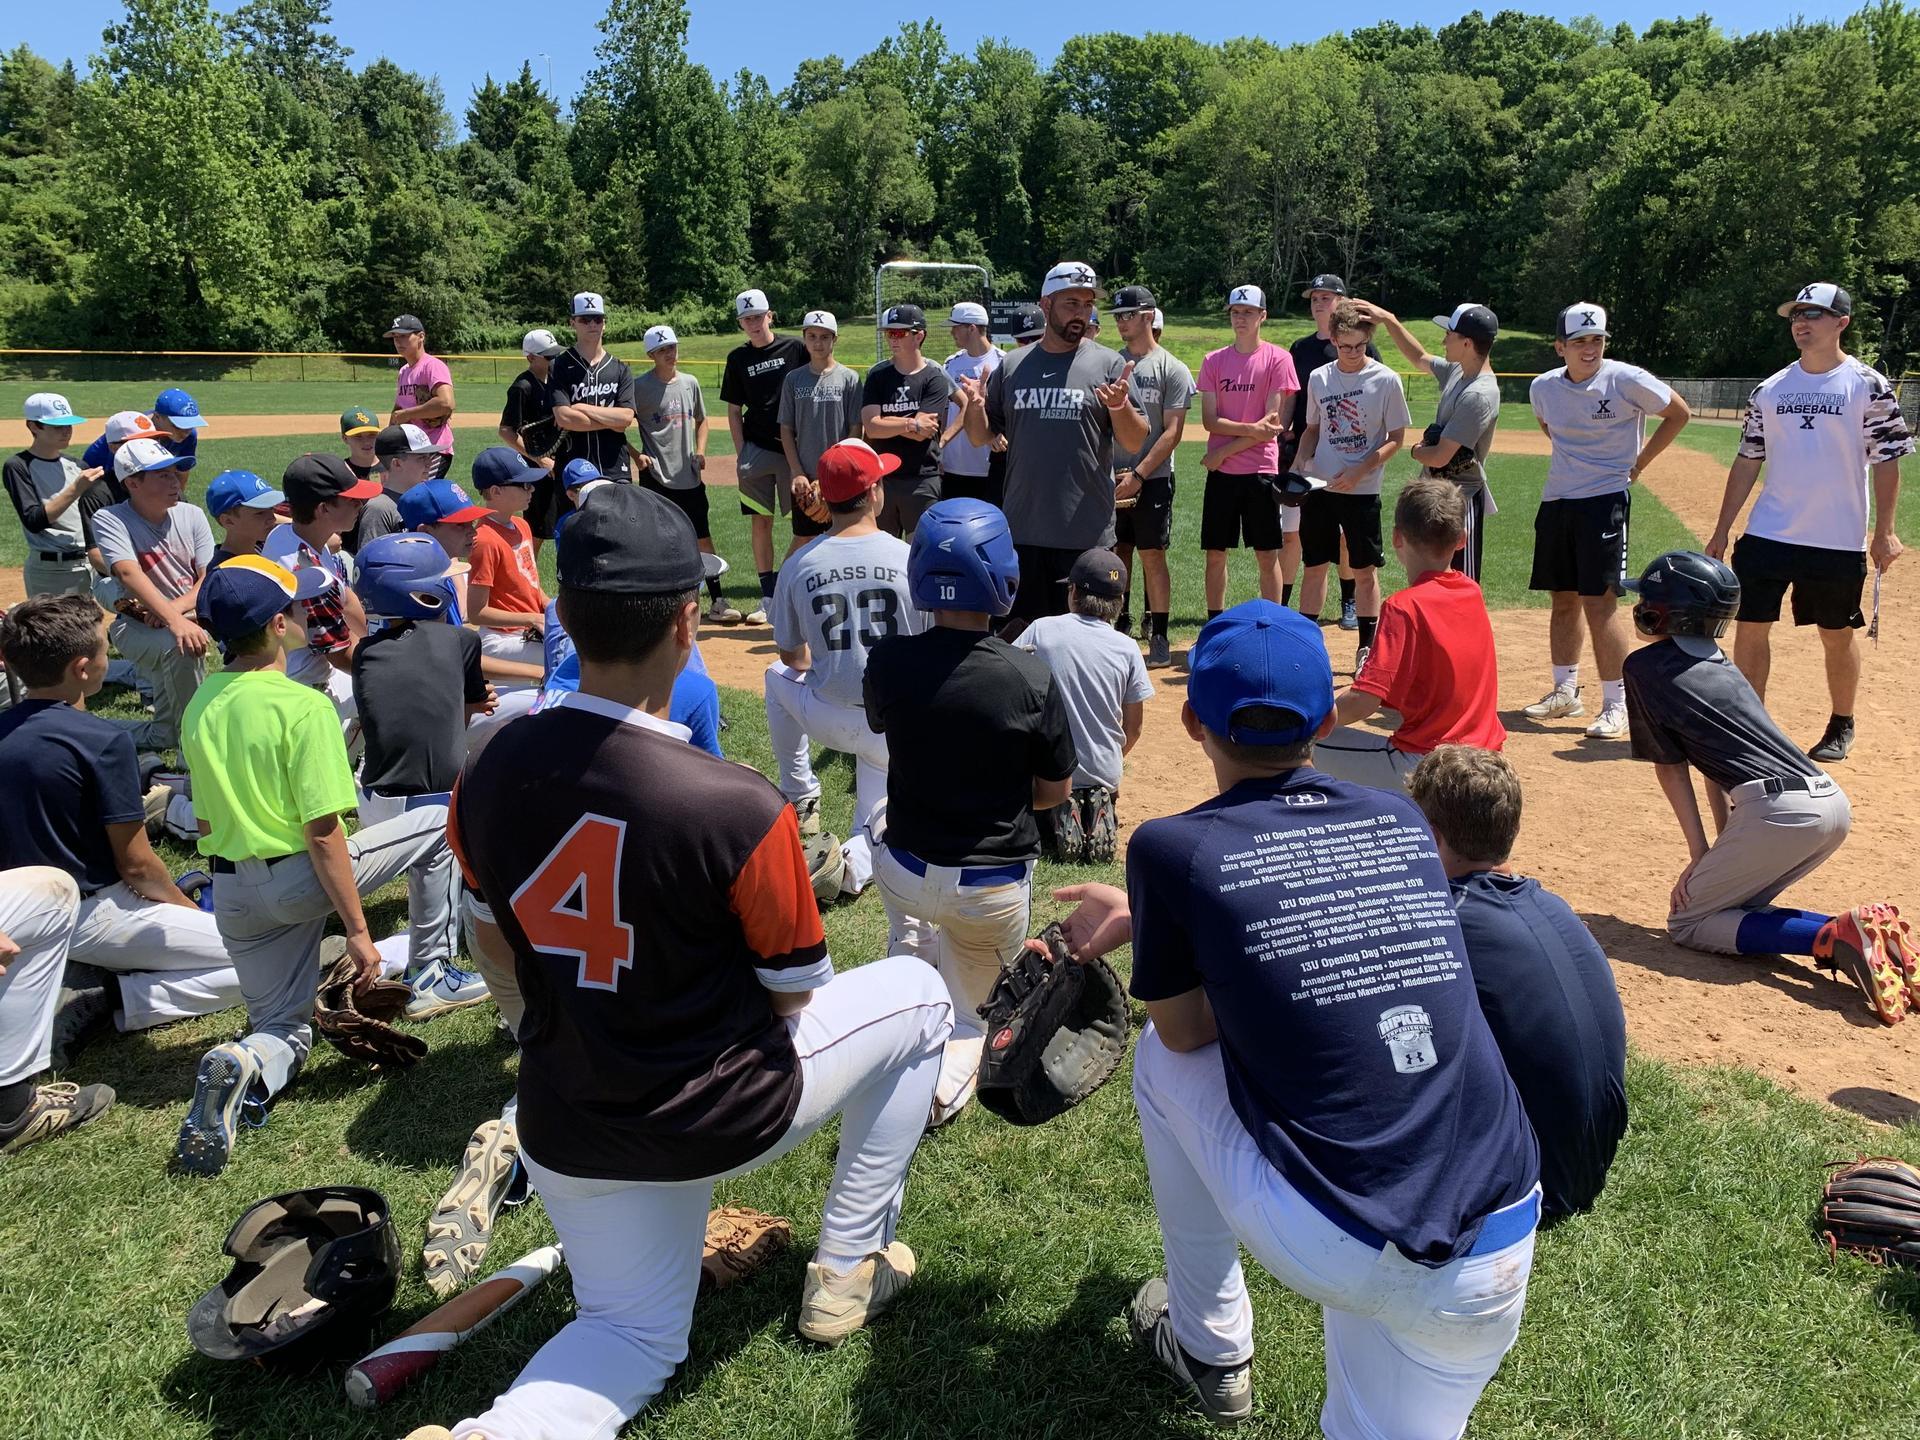 Summer Baseball Camp 2019